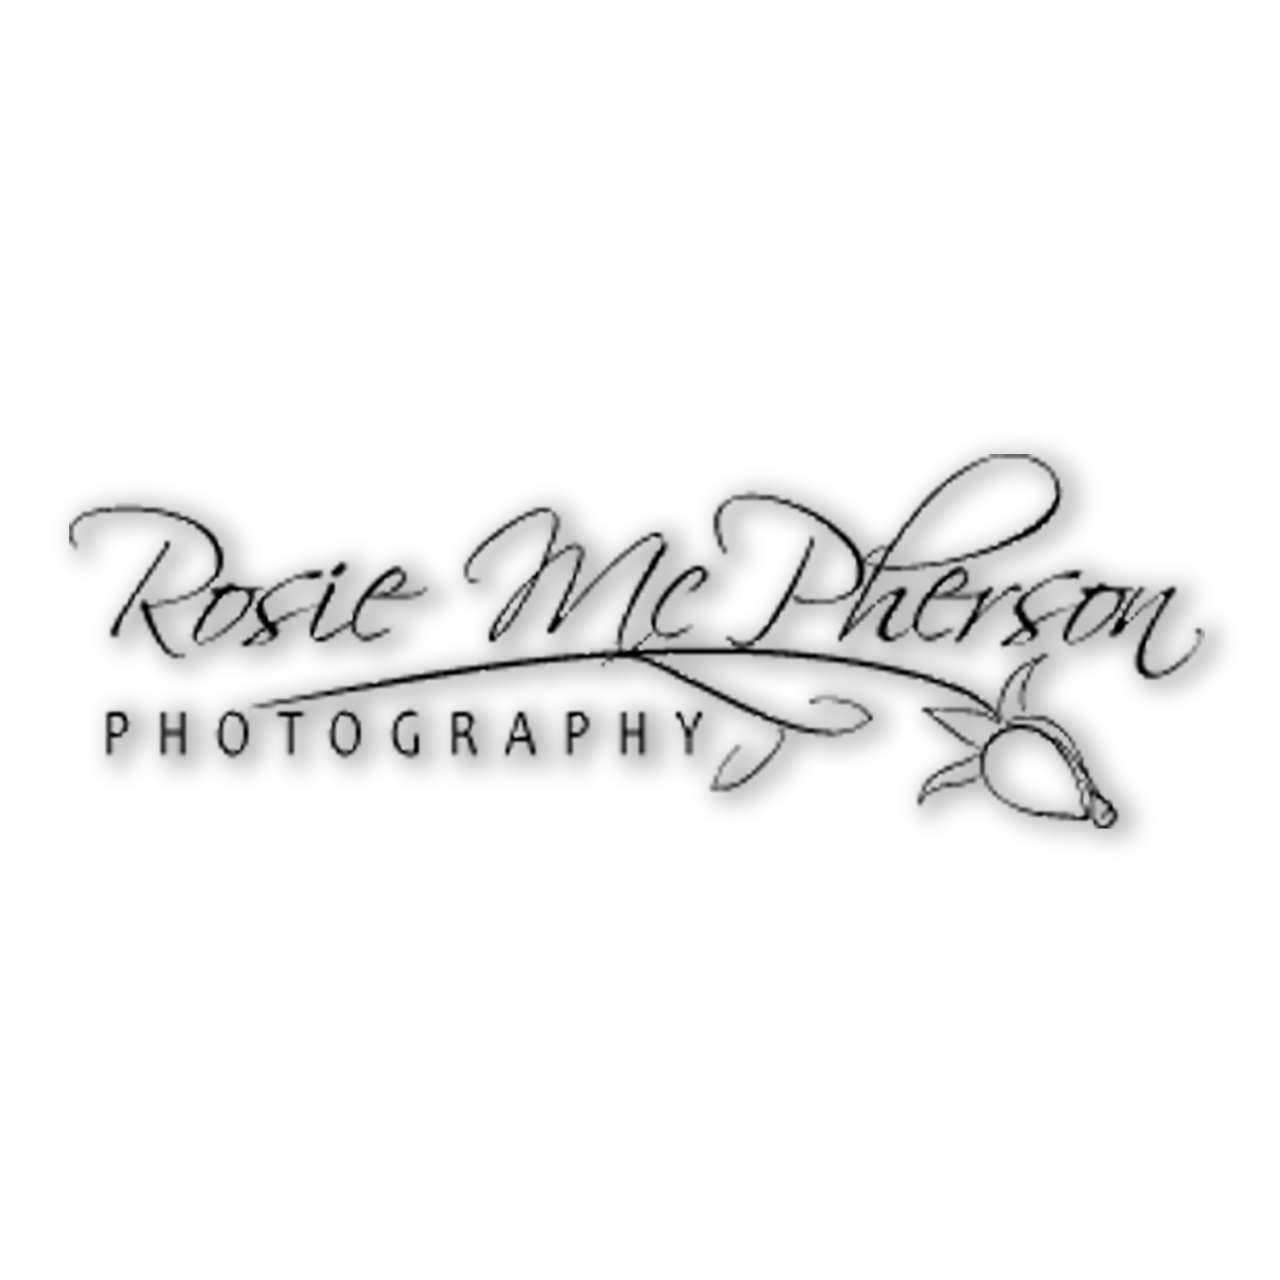 Rosie McPherson Photography